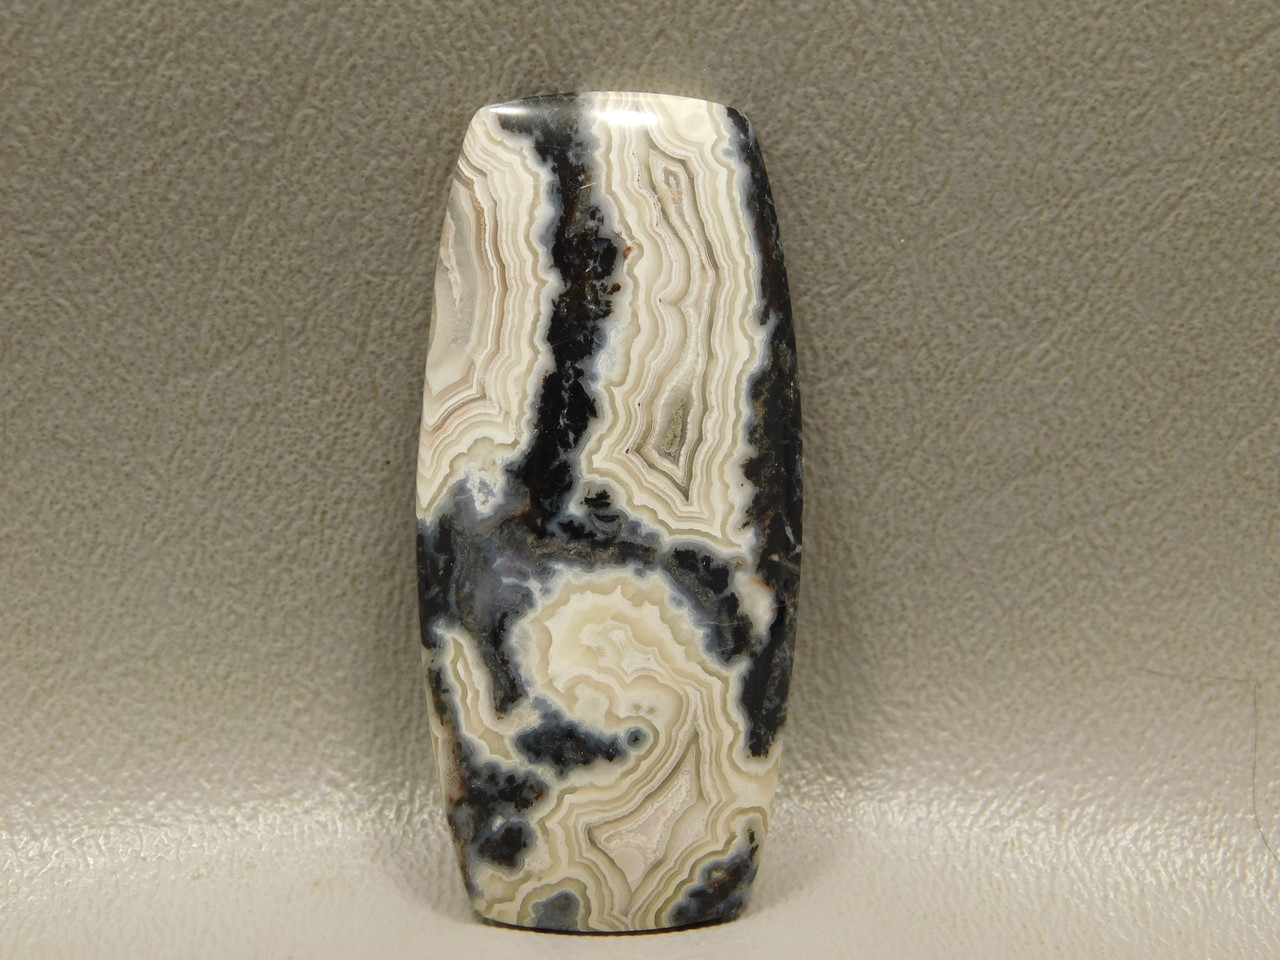 Cabochon Crazy Lace Agate Barrel Shaped Stone #2